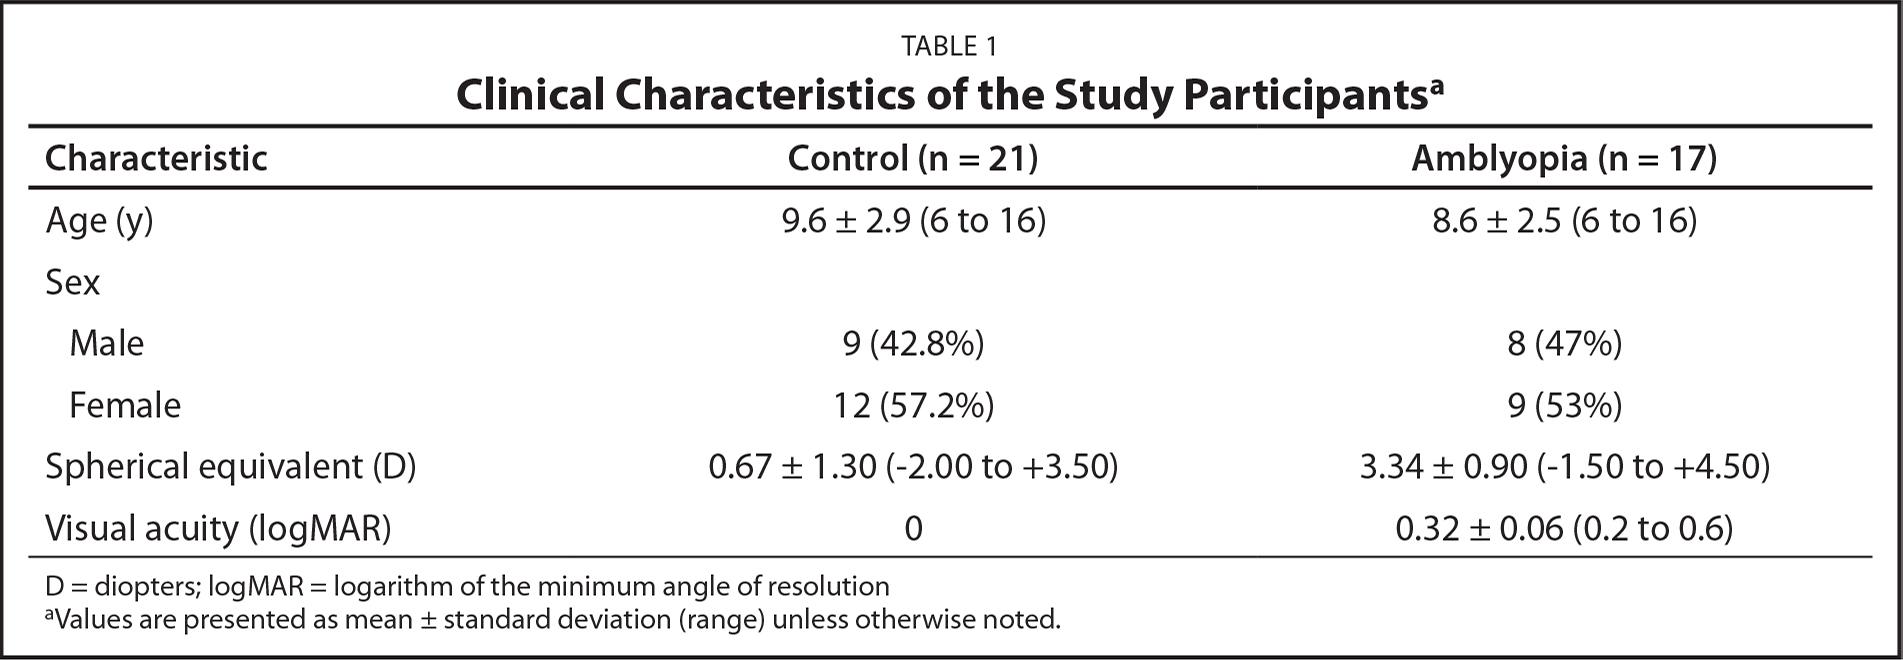 Clinical Characteristics of the Study Participantsa